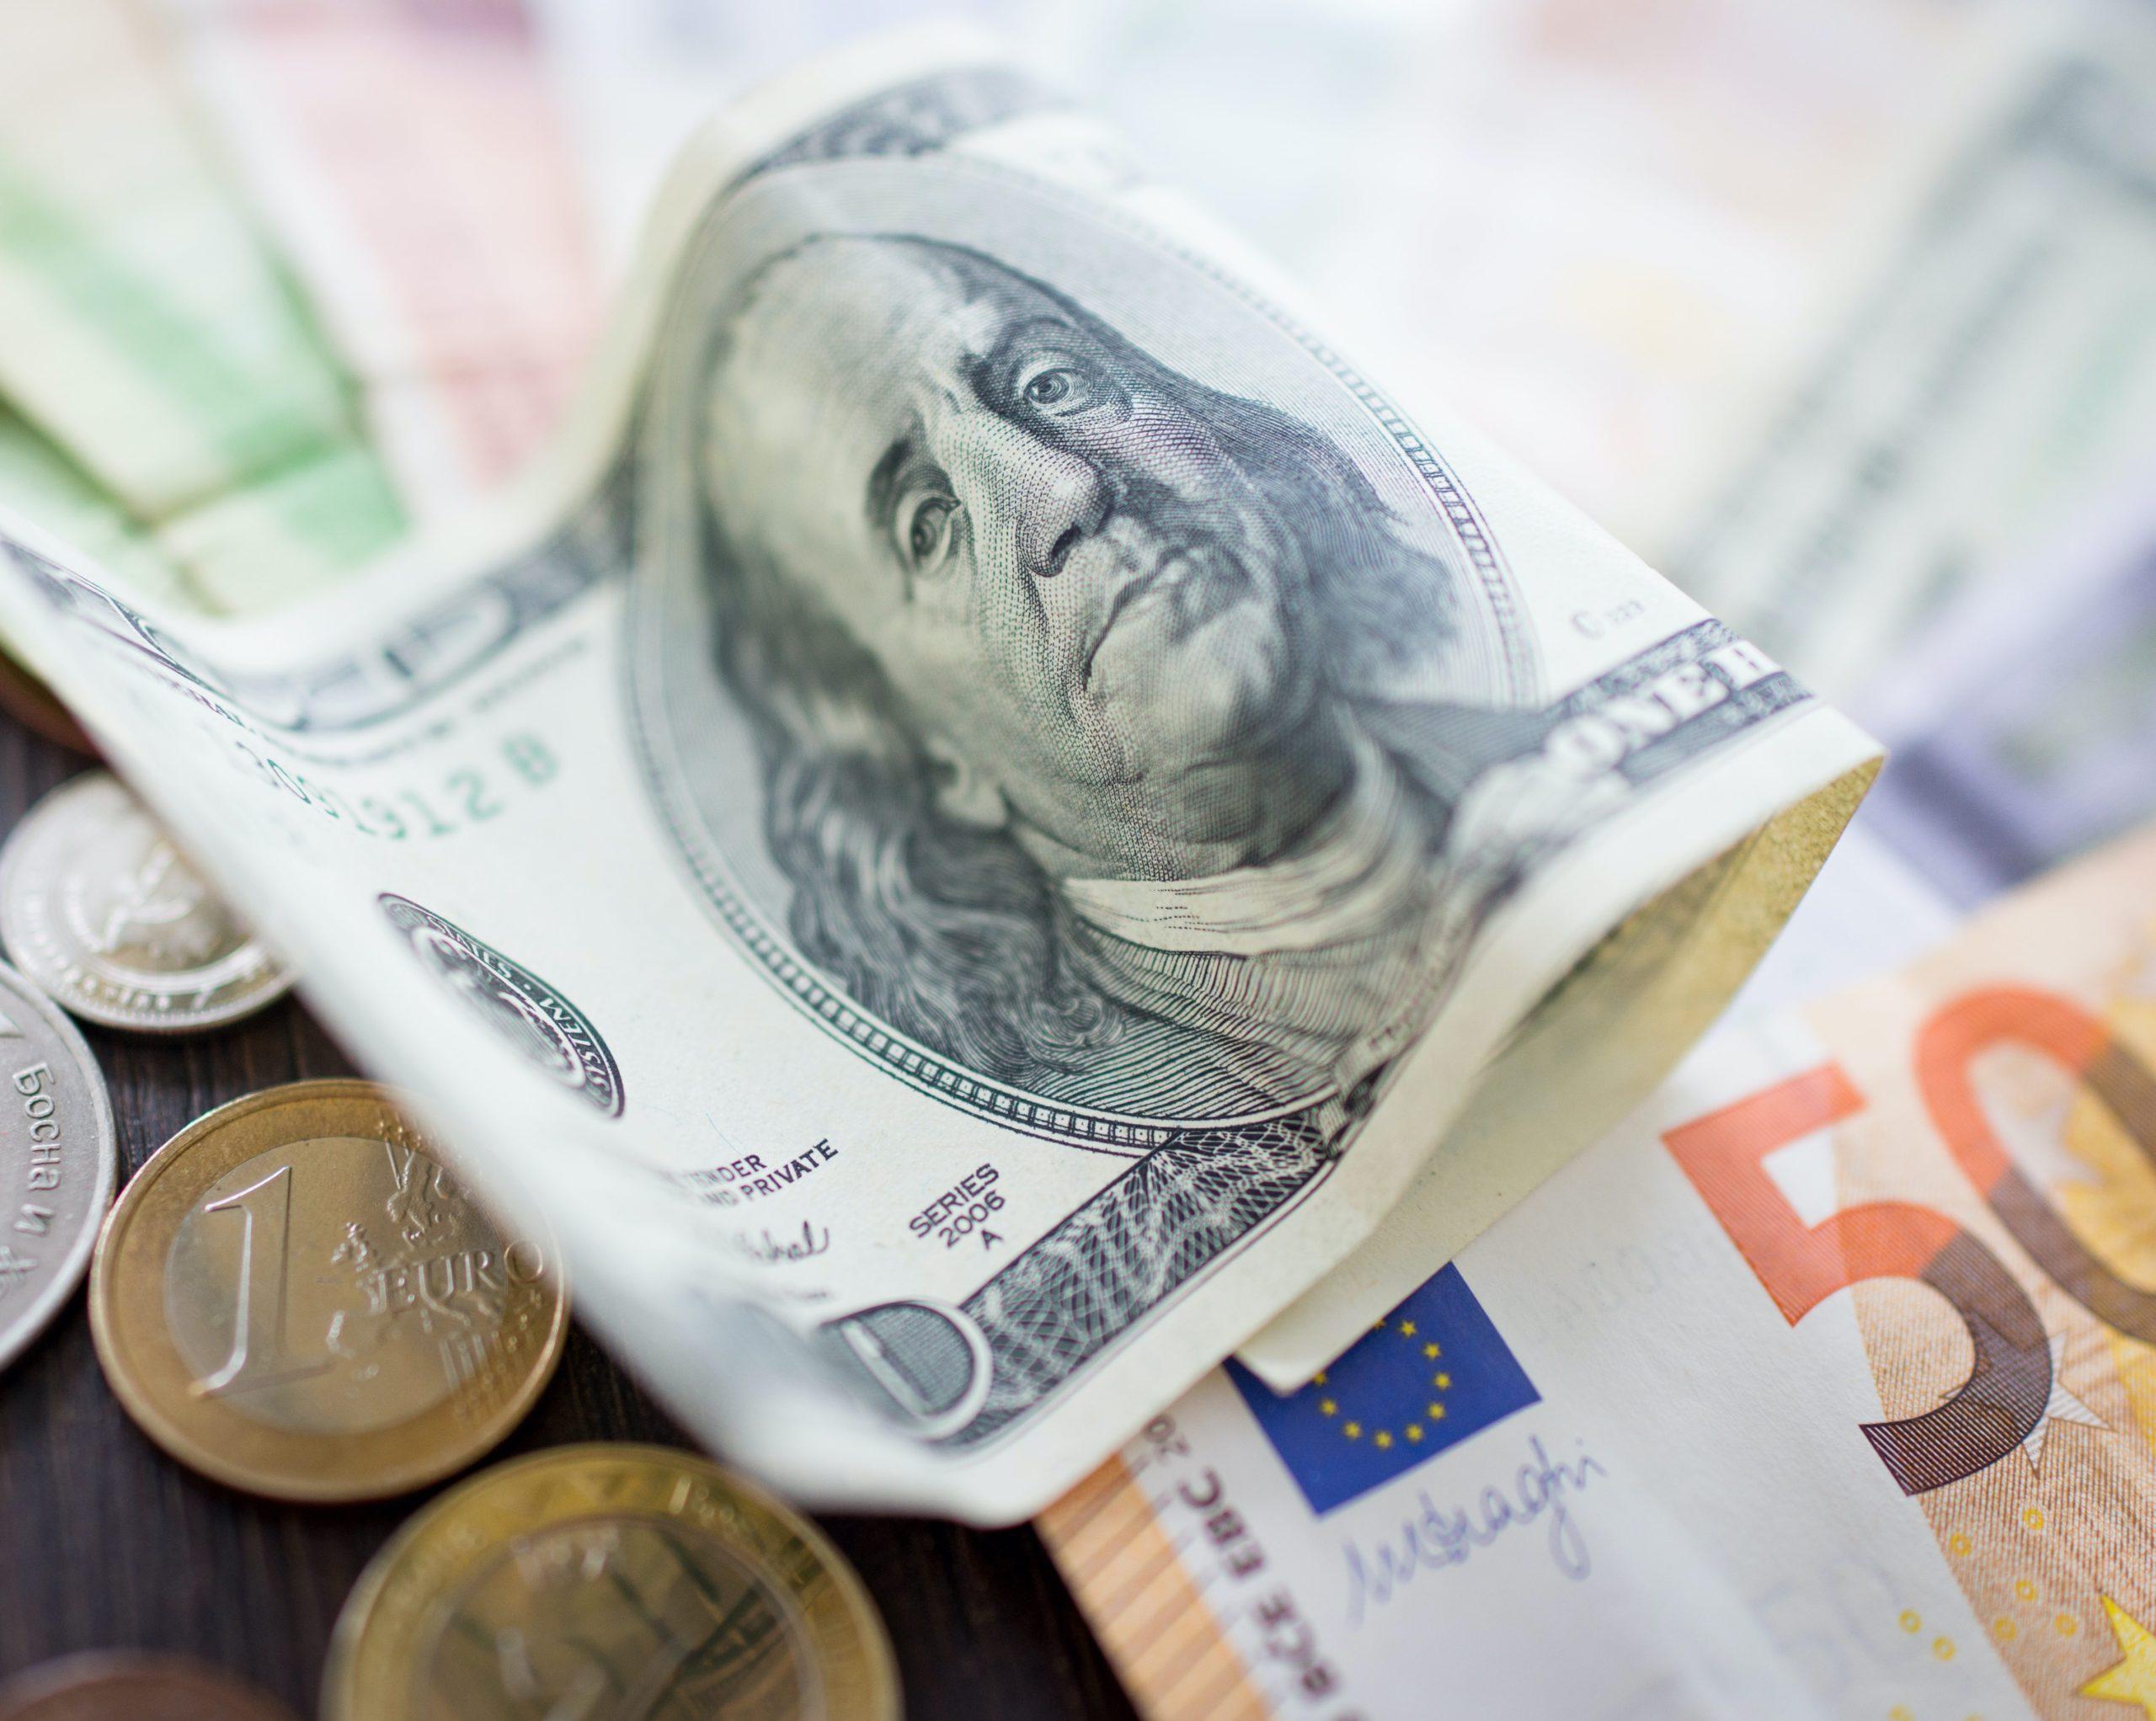 29/07 – Dollar tracks lower but Covid risks remain